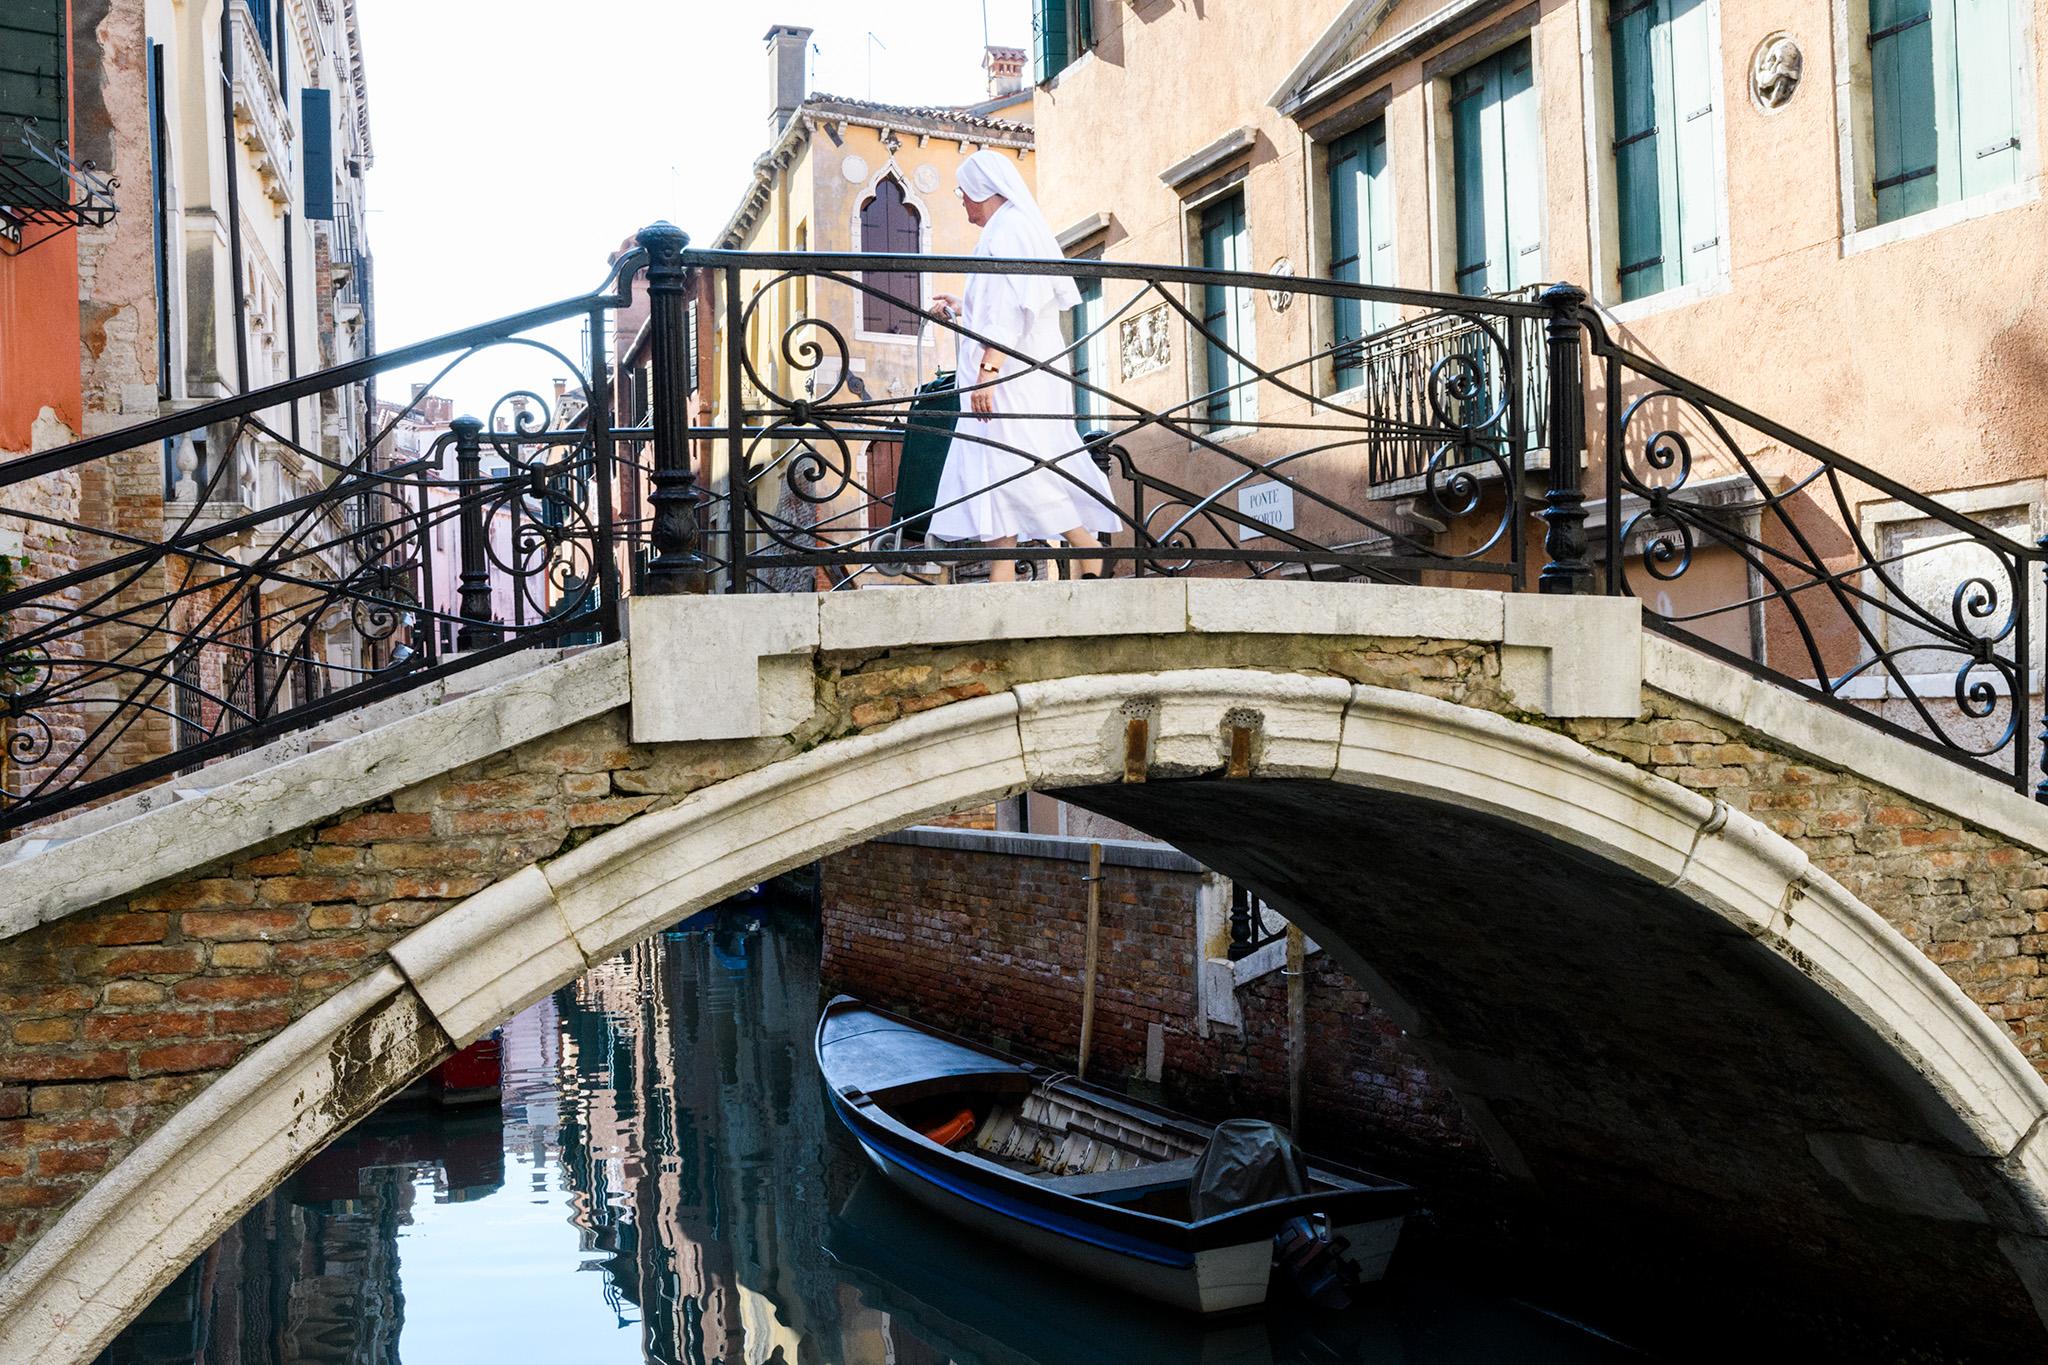 20171002 - Venice - 466.jpg